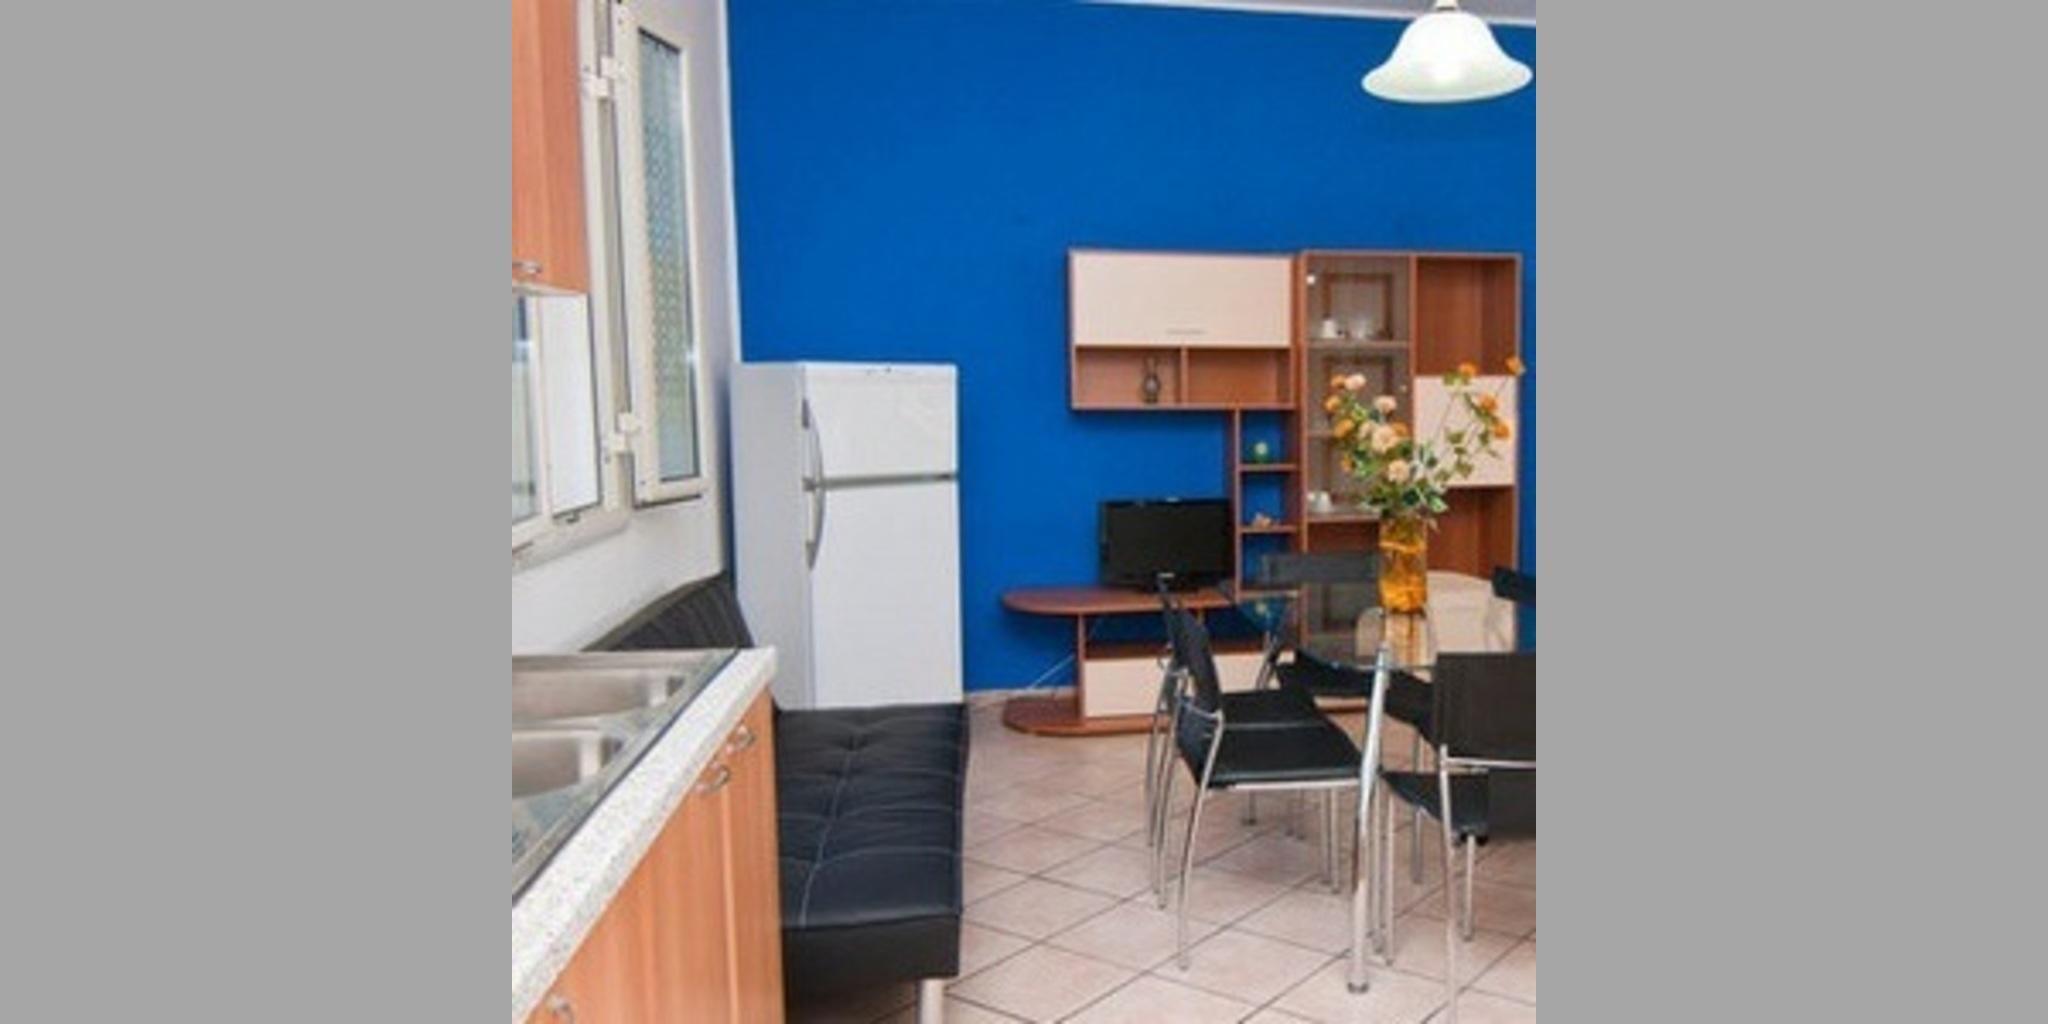 Apartamento Campofelice Di Roccella - Campofelice Di Roccella